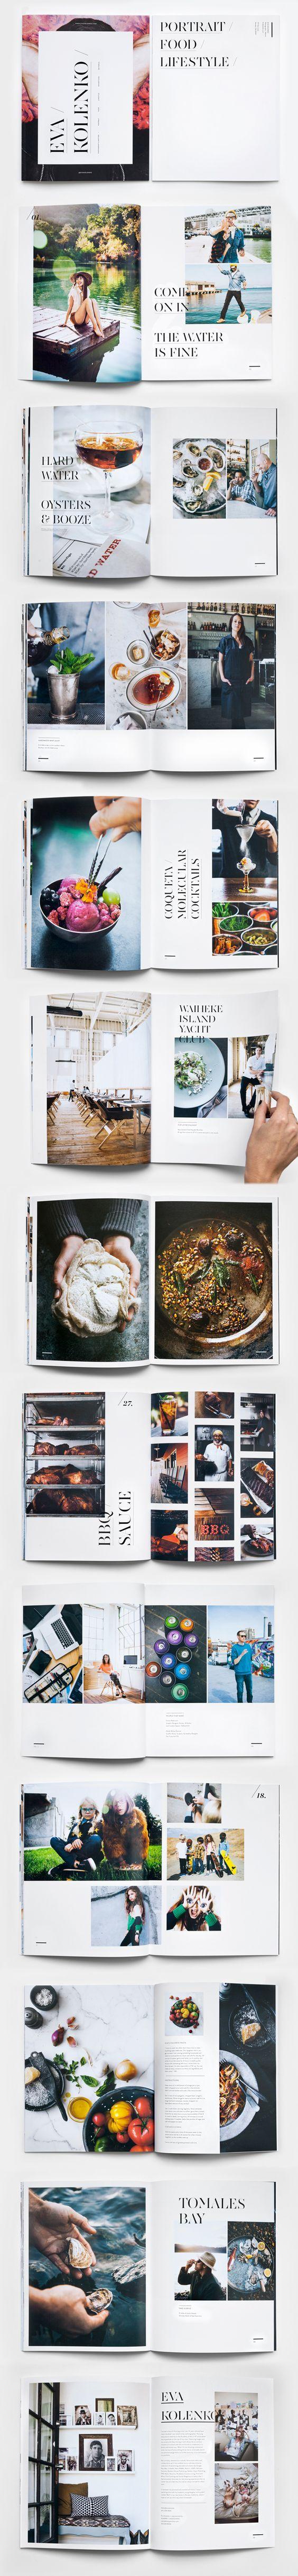 Kolenko Photography Promo Book Designed by Emma Robertson: